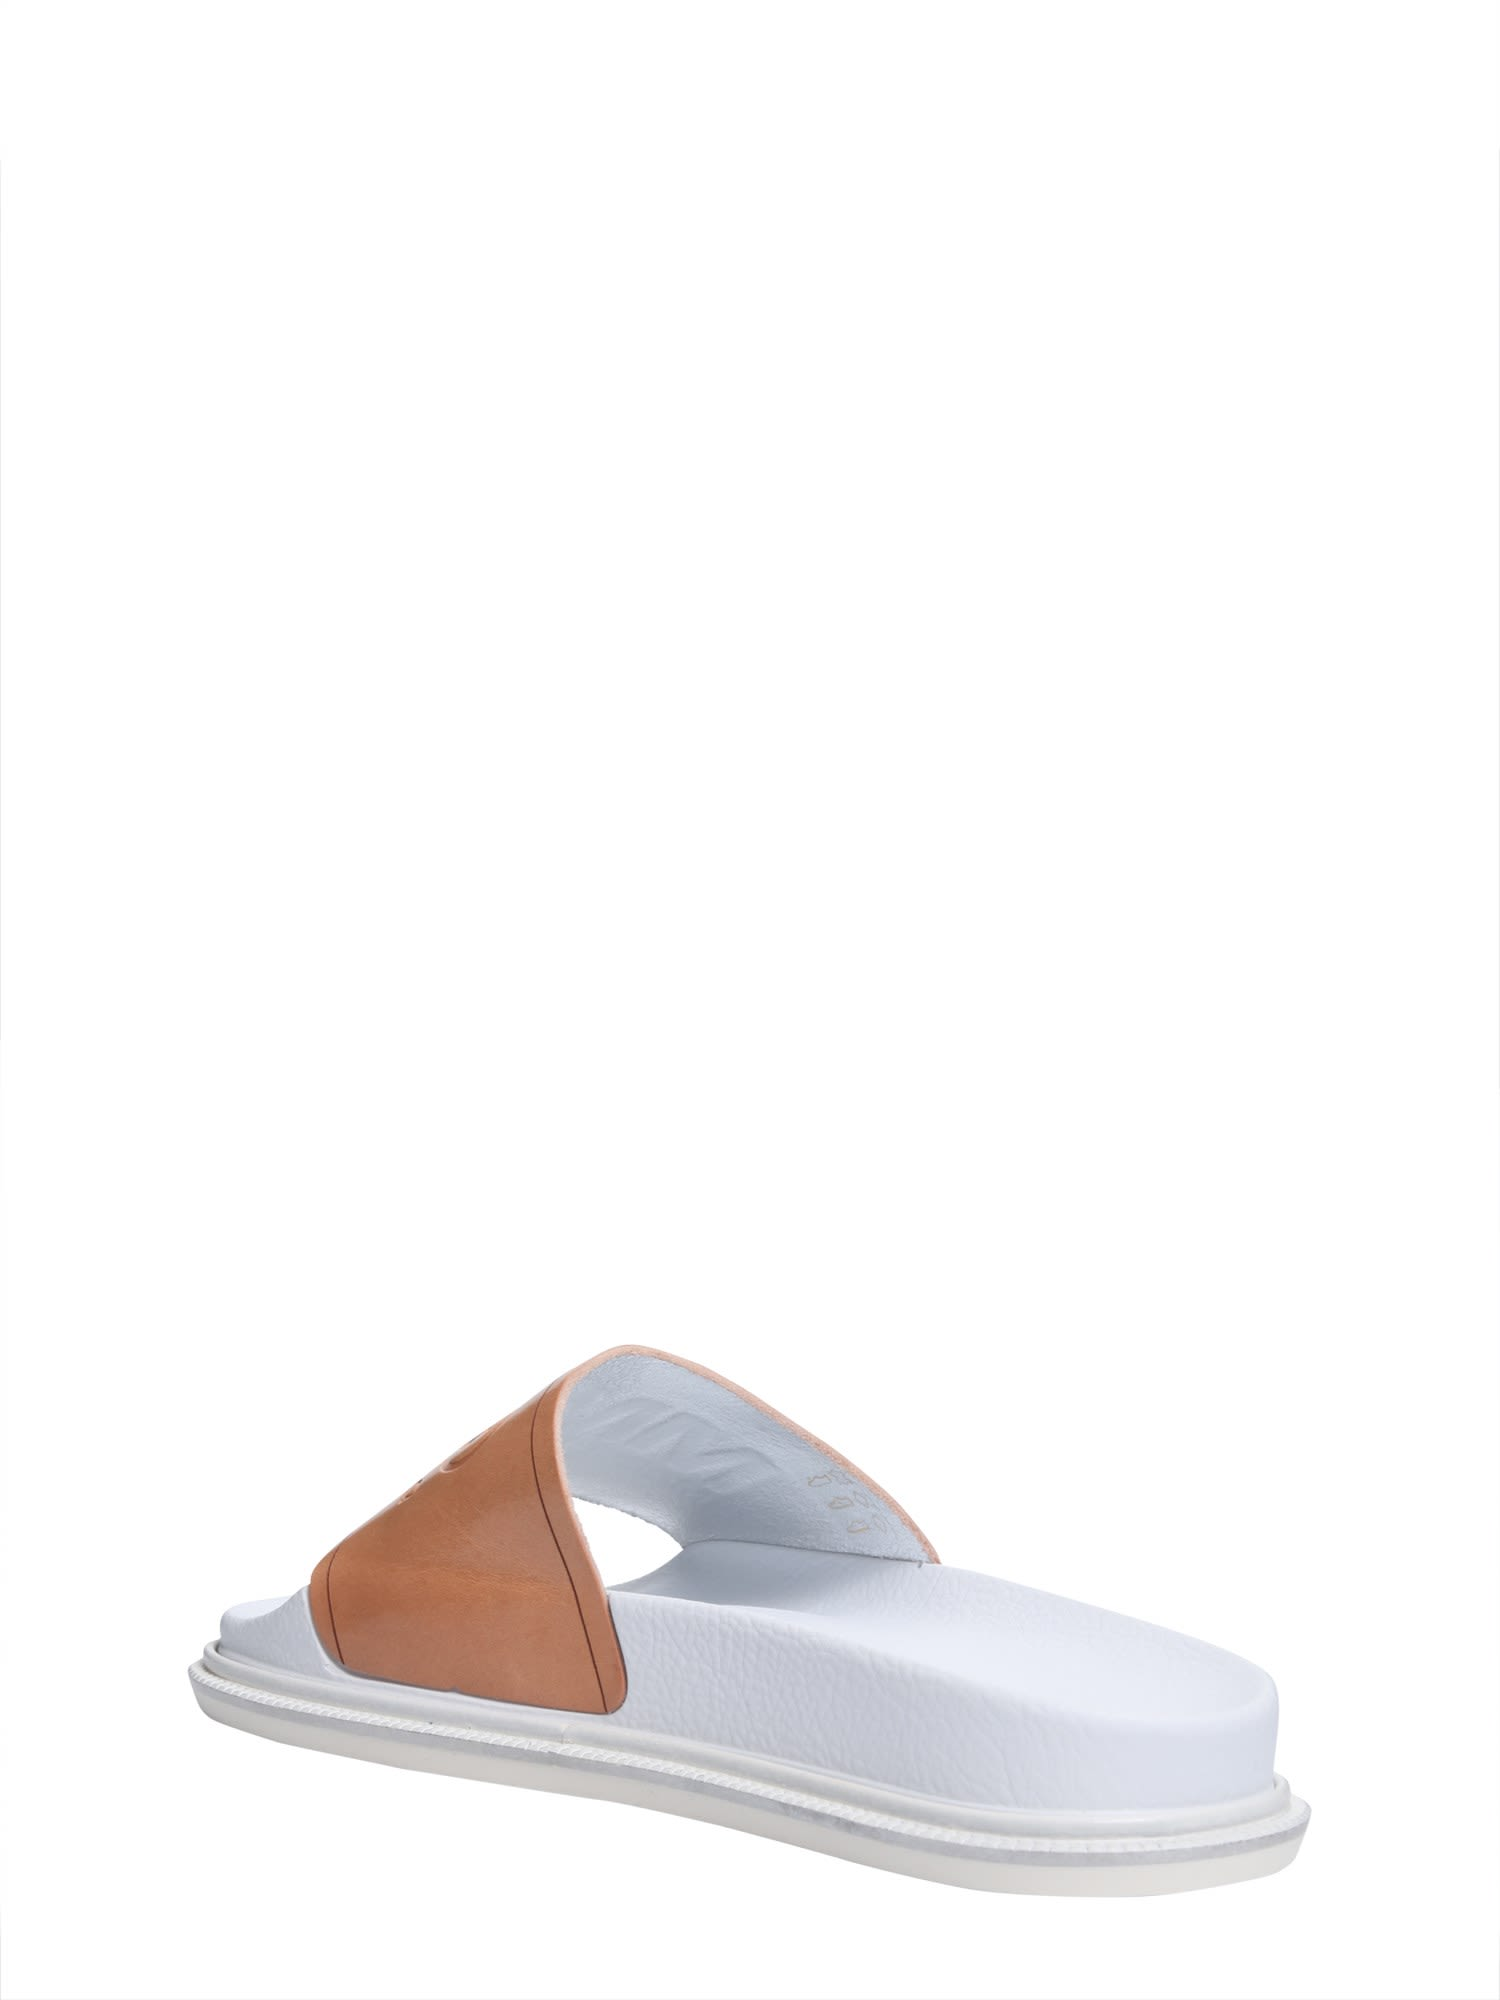 MM6 MAISON MARGIELA Slide sandals with logo gHn63Fk